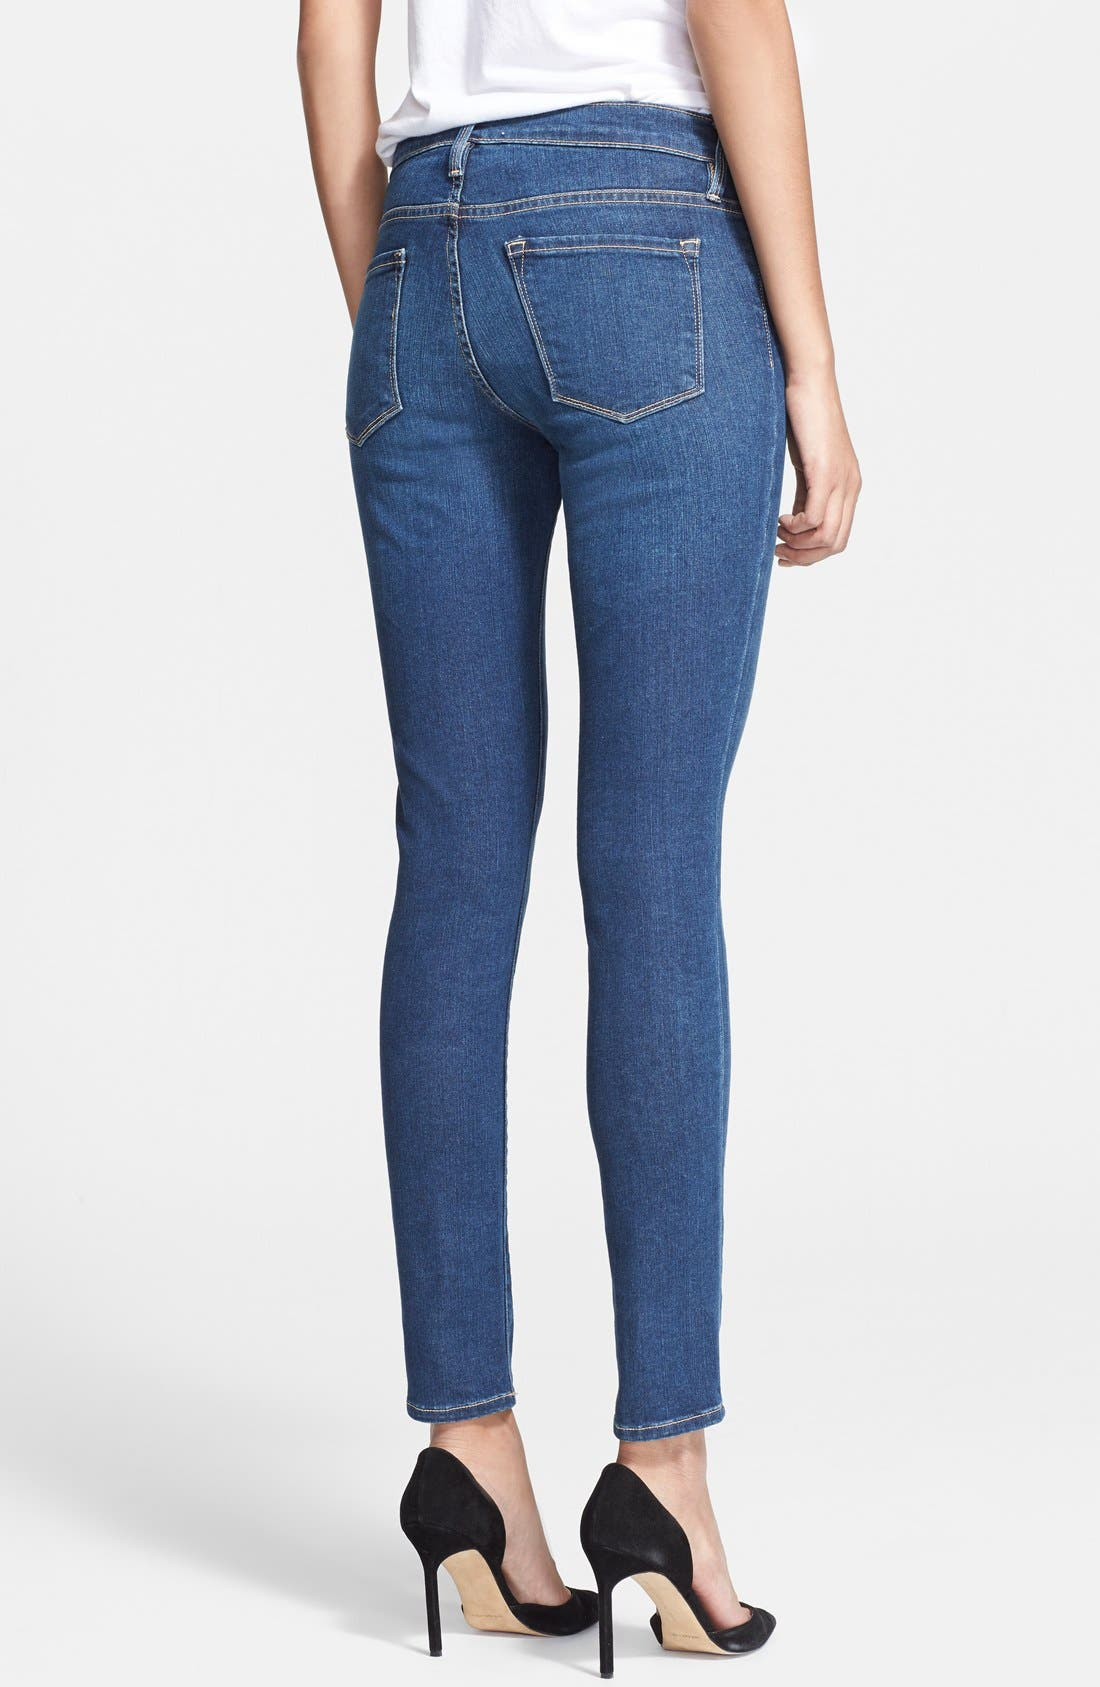 Alternate Image 2  - Frame Denim 'Le Skinny de Jeanne' Jeans (Columbia Road)